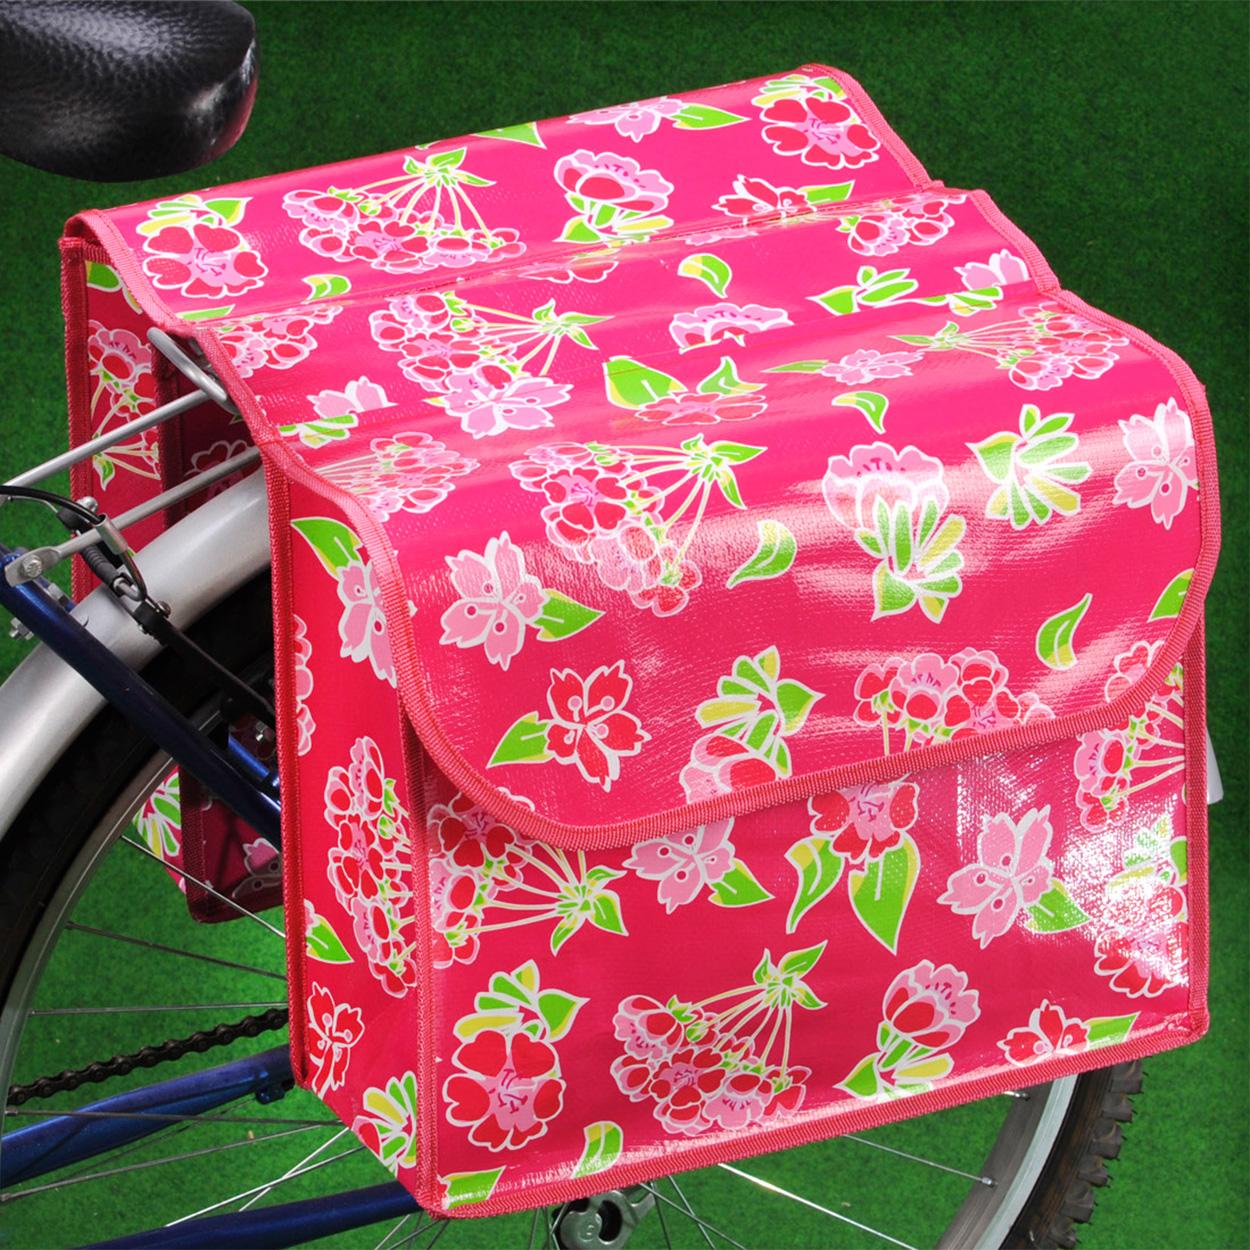 Fietstas Roze : Dubbele fietstas roze kopen lobbes